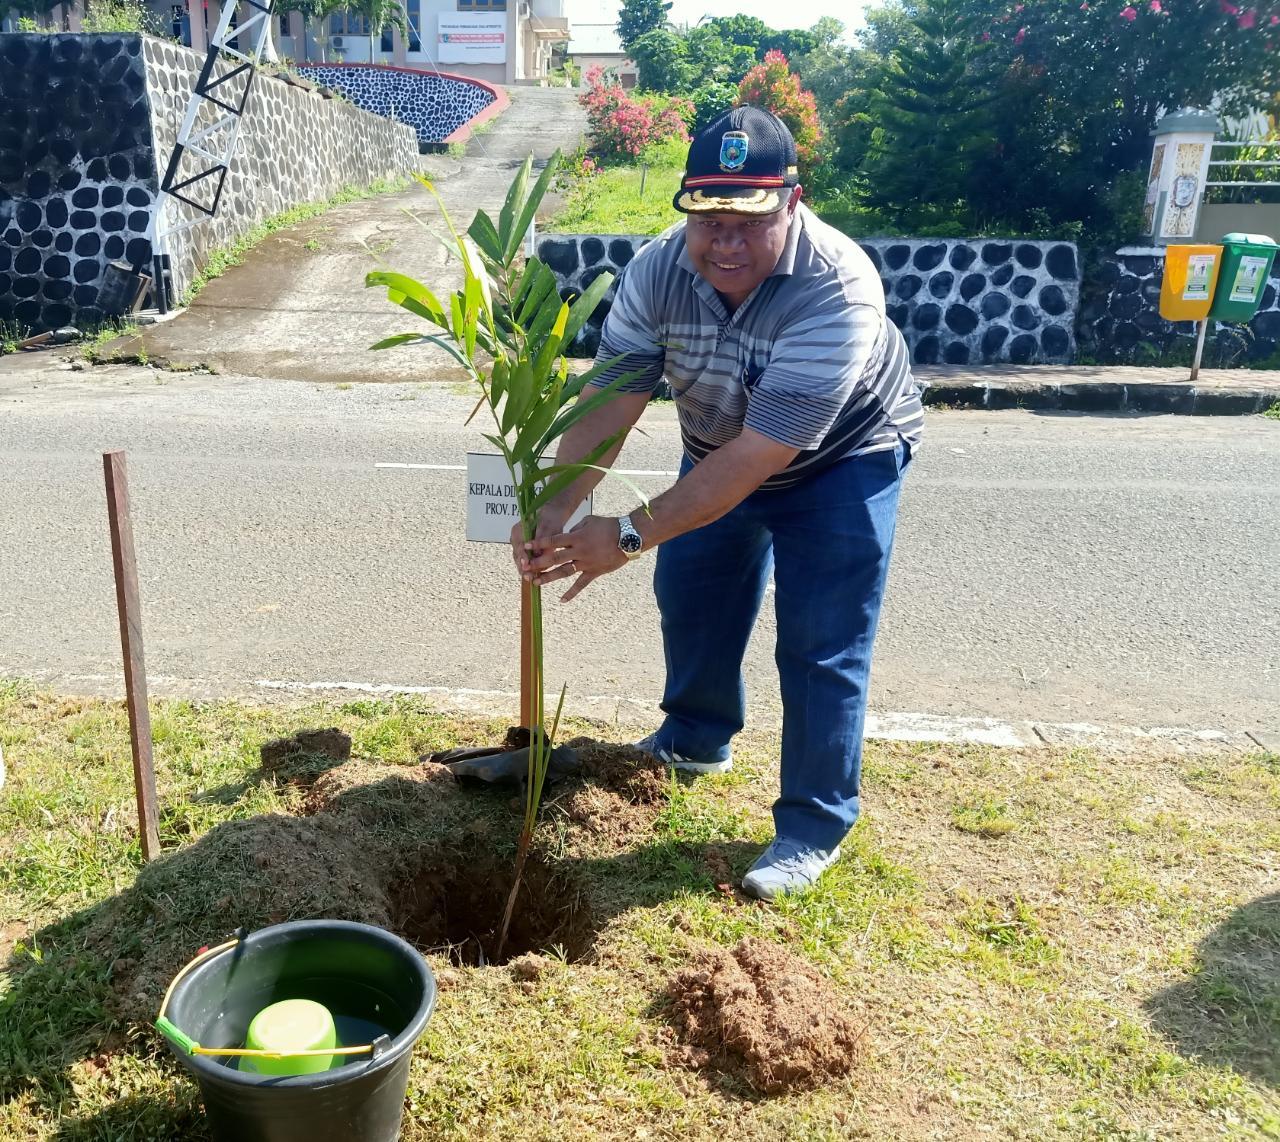 Hari Rimbawan ke-36, Dinas Kehutanan Papua Barat Tanam 200 Pohon 16 IMG 20200314 WA0015